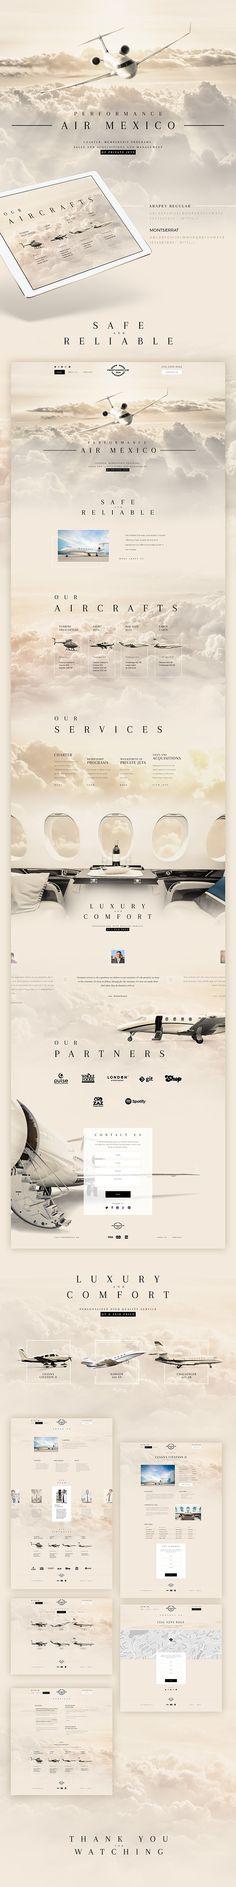 Airport. Plane. Web design. Website. site / tamplate.